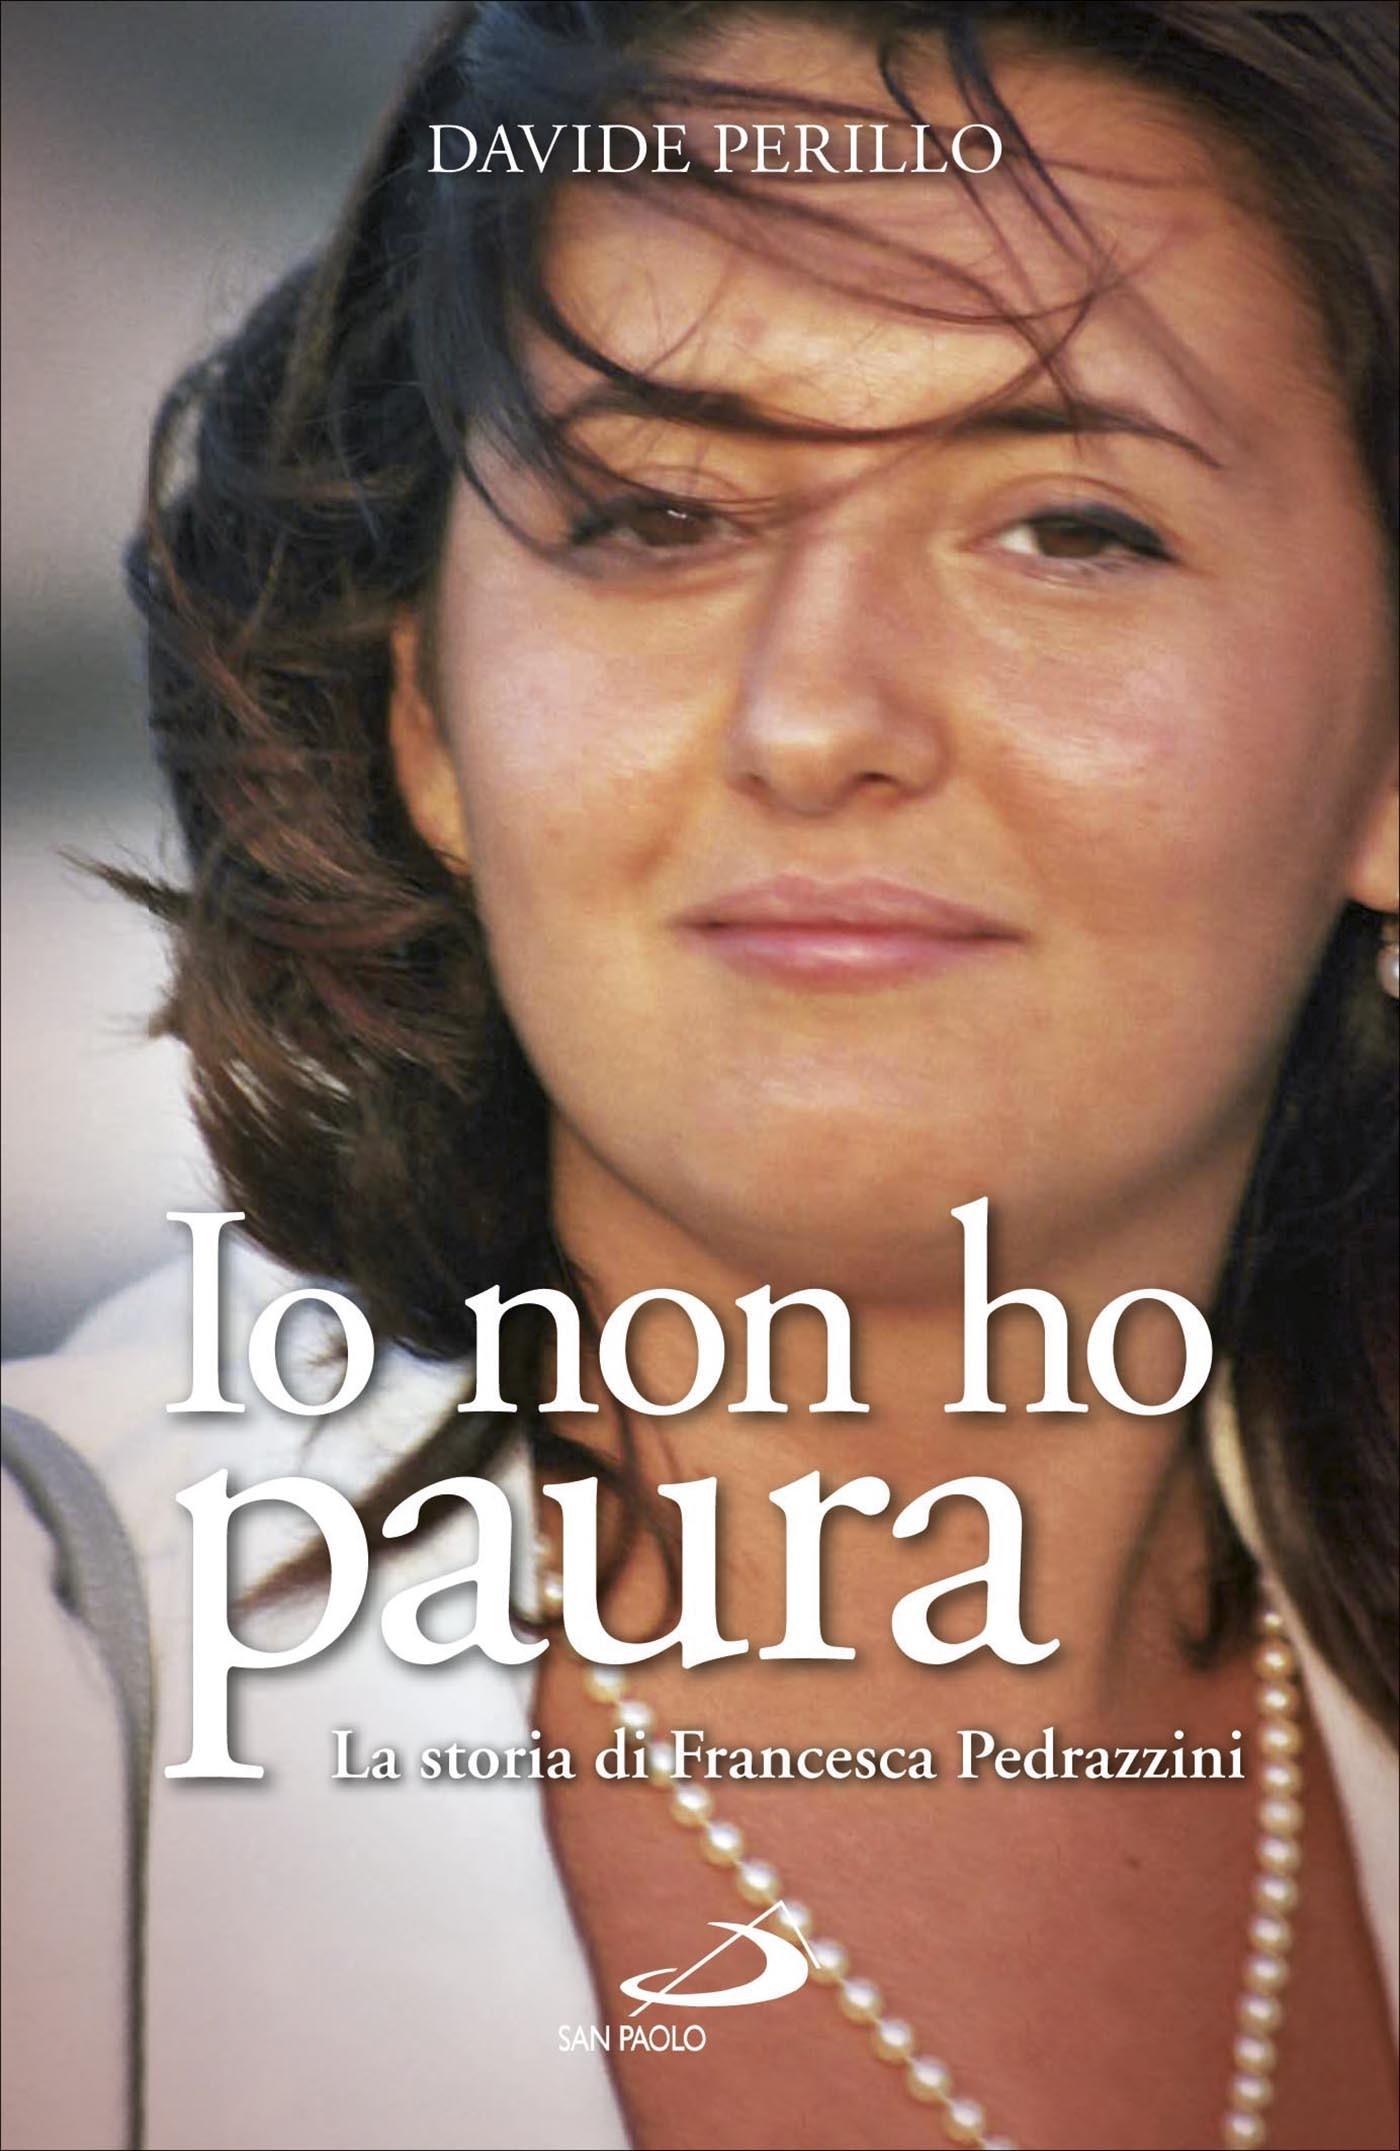 Francesca Pedrazzini